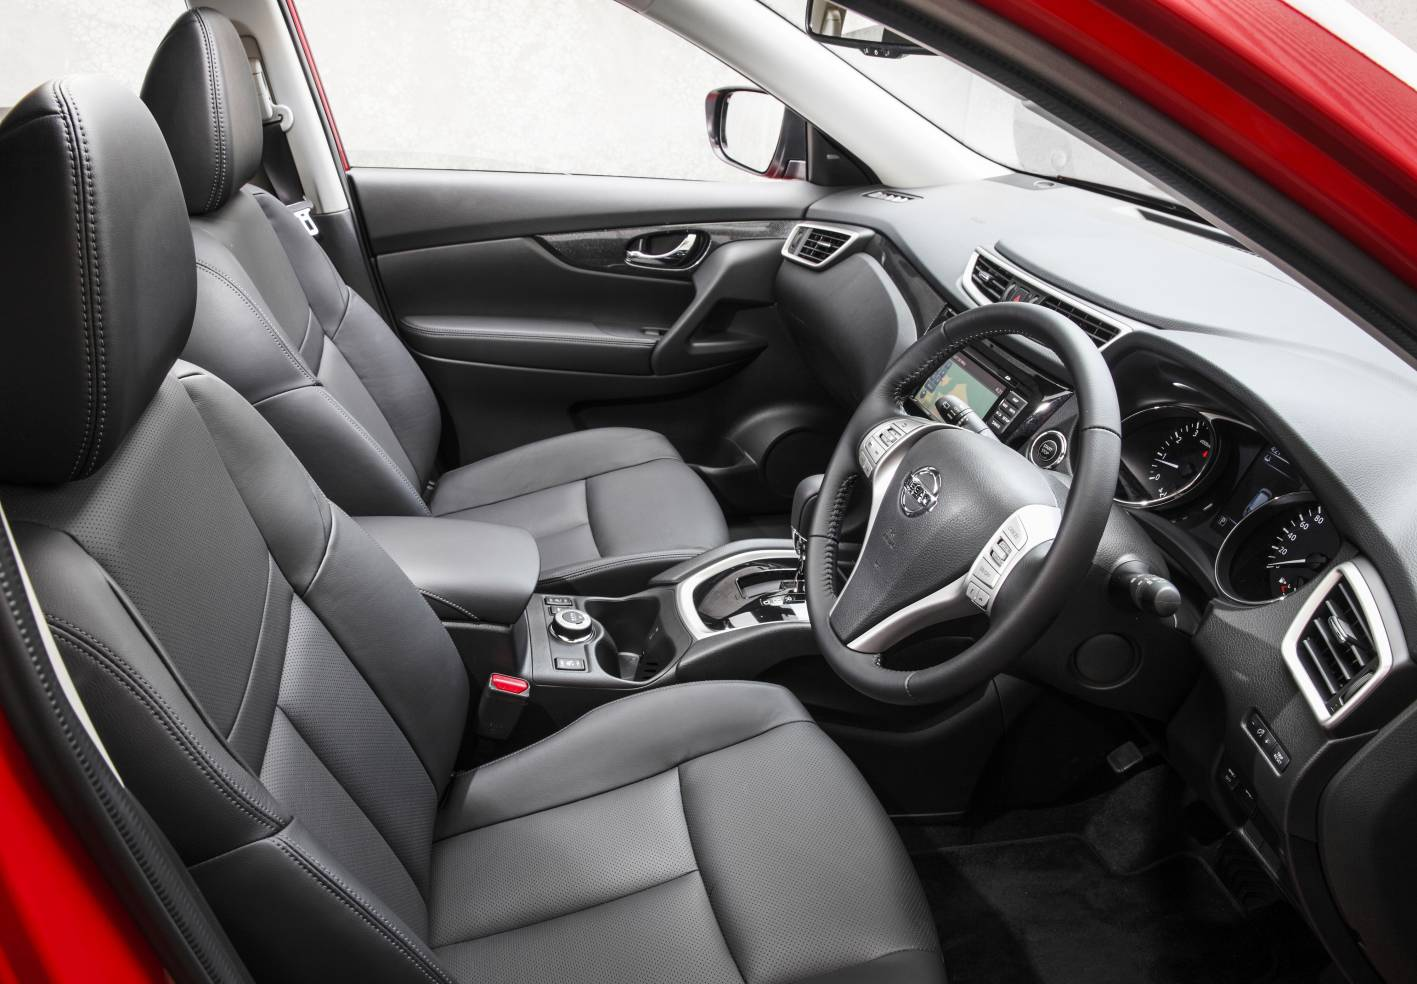 2014 Nissan X-Trail 17.jpg